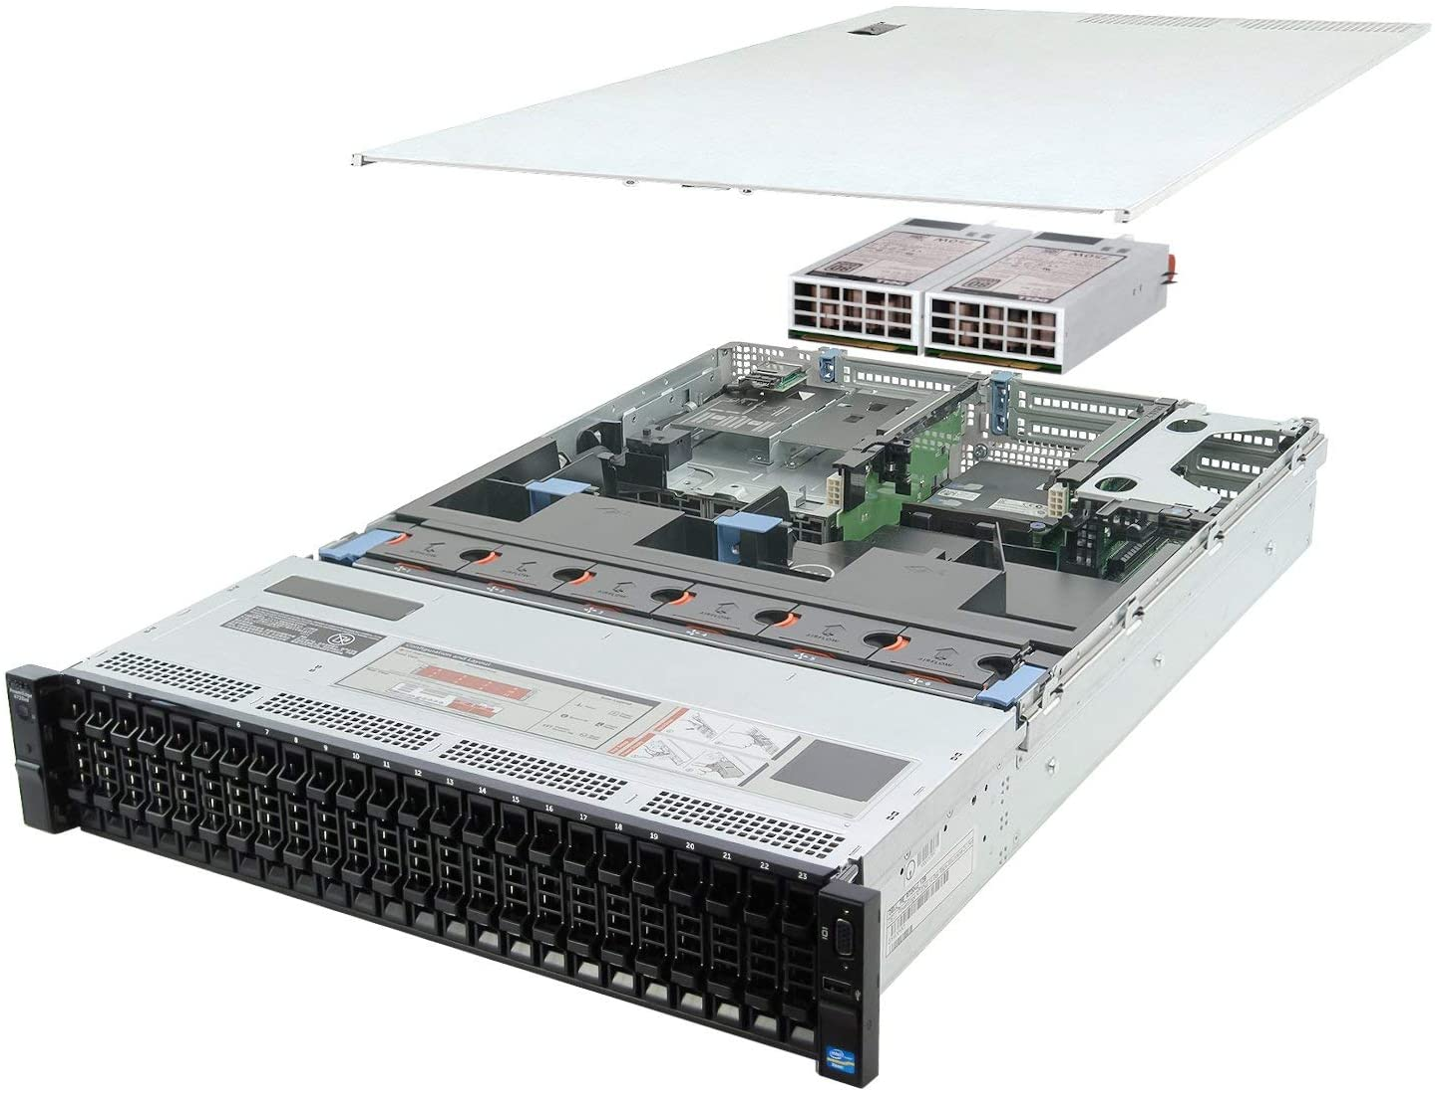 Dell PowerEdge R720xd Server 2X 2.50Ghz E5-2640 6C 32GB 2X Caddies Mid-Level (Renewed)